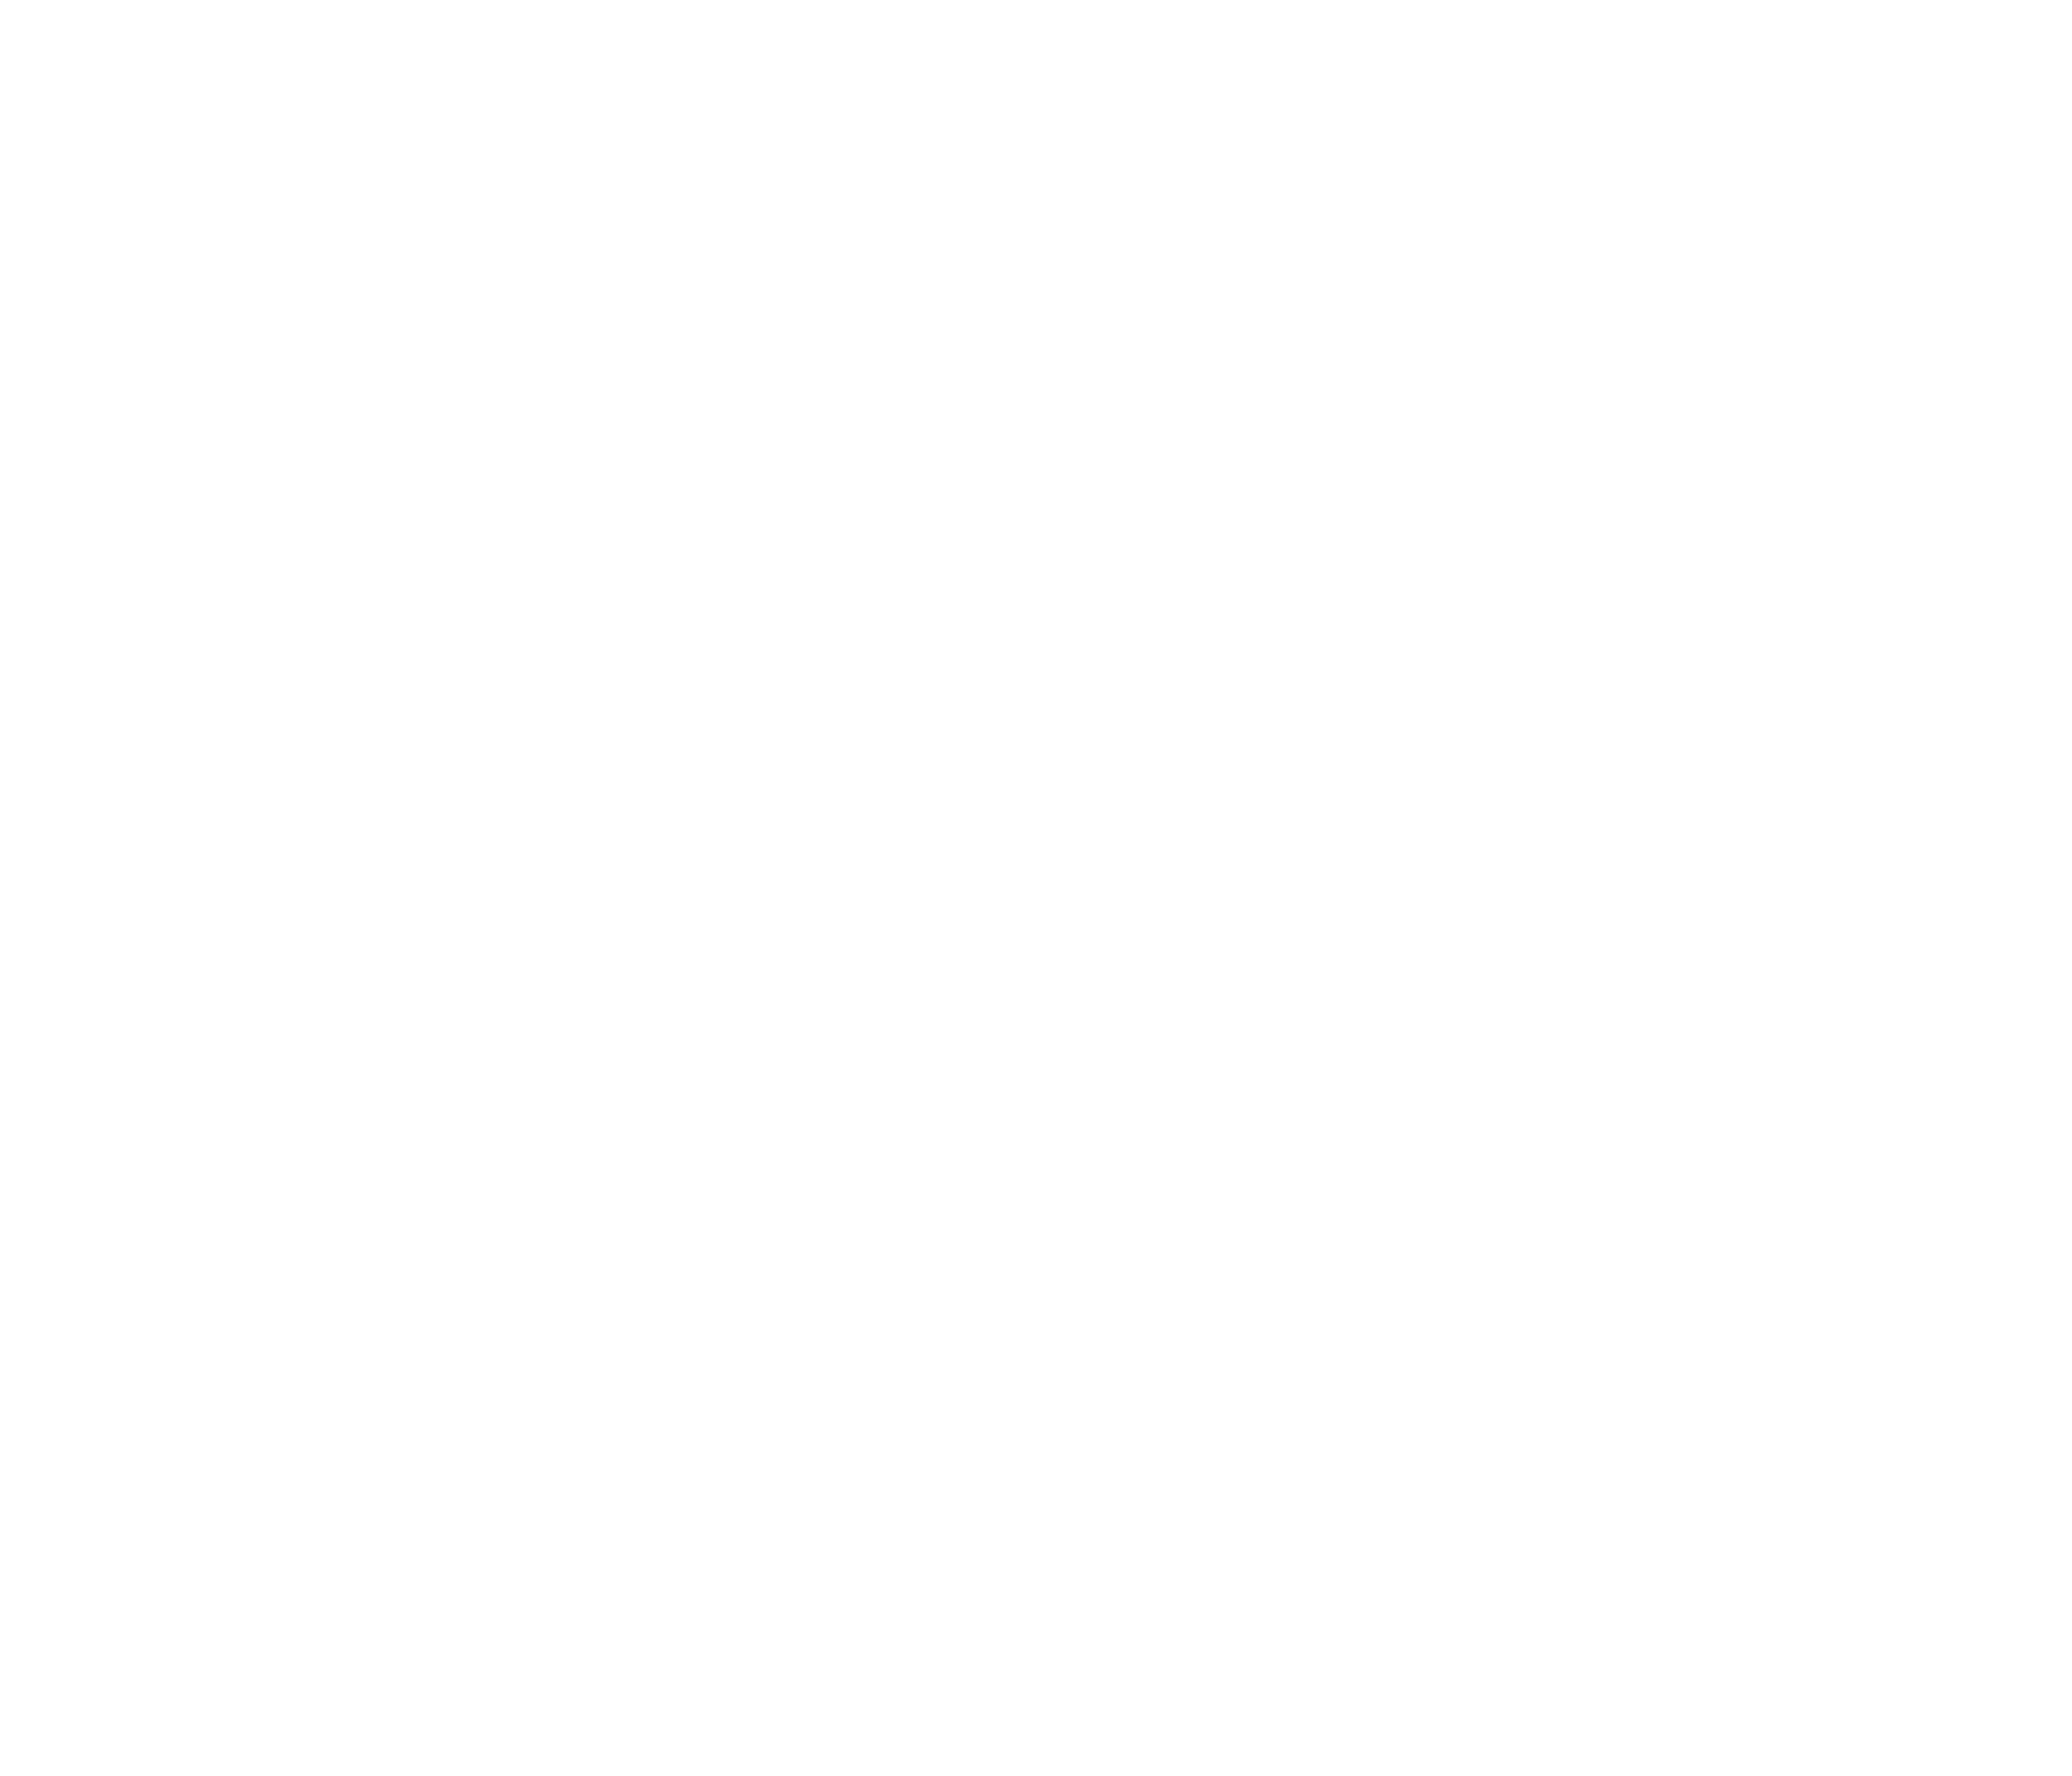 FLL-CMYK_Challenge-vert-one-color-reverse